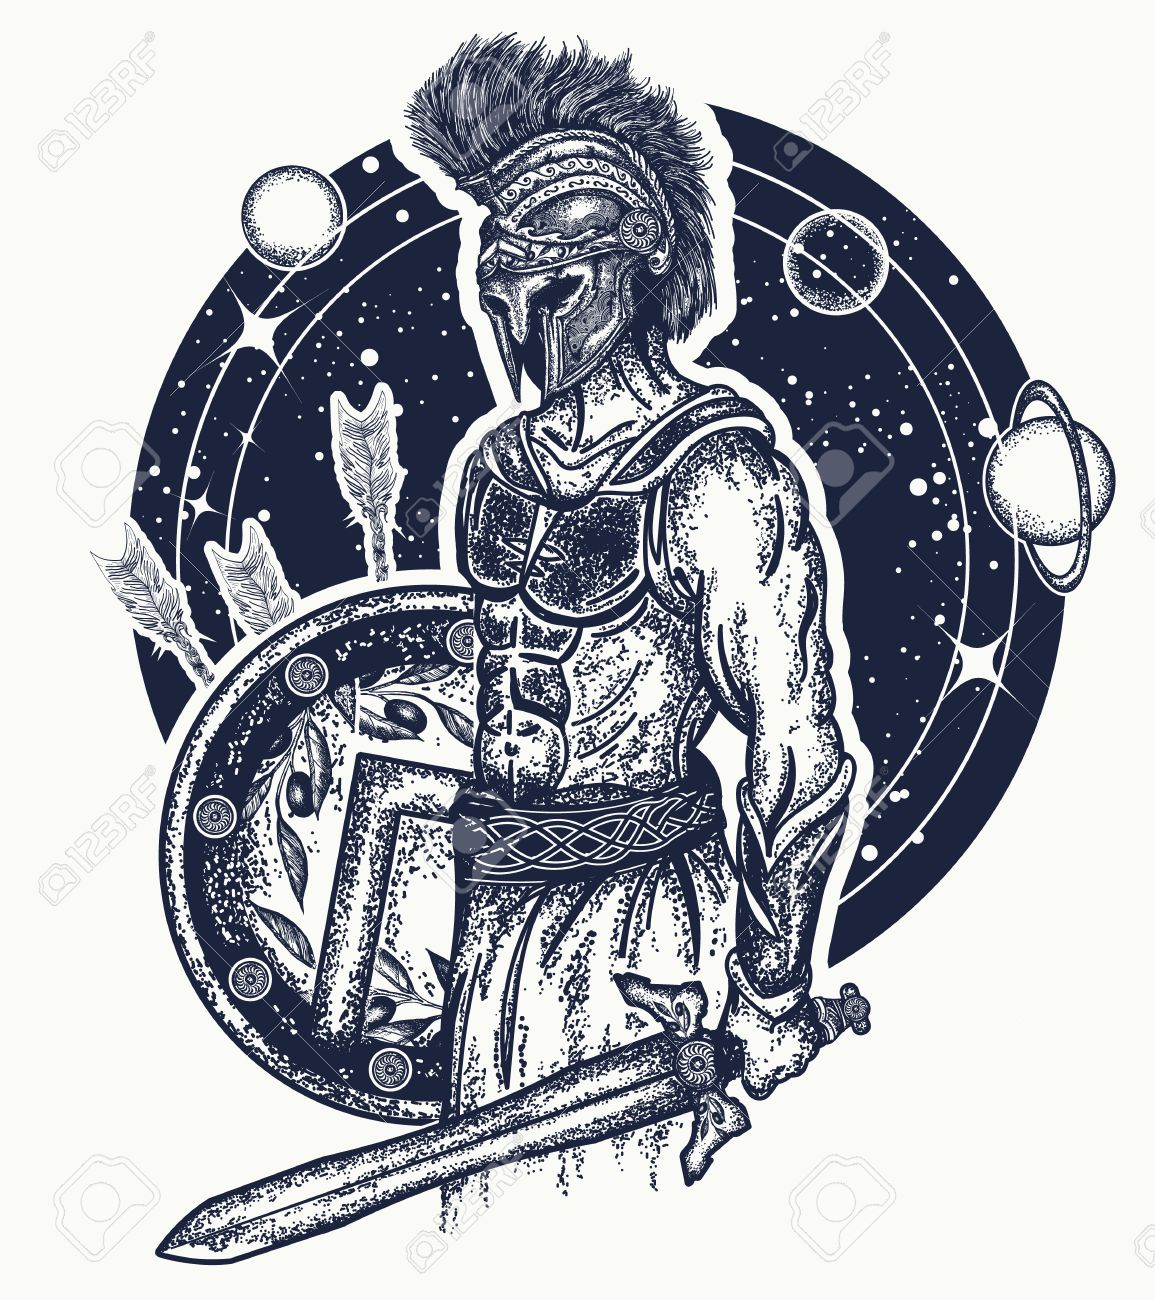 1155x1300 Gladiator Spartan Warrior Holding Sword And Shield Tattoo Art